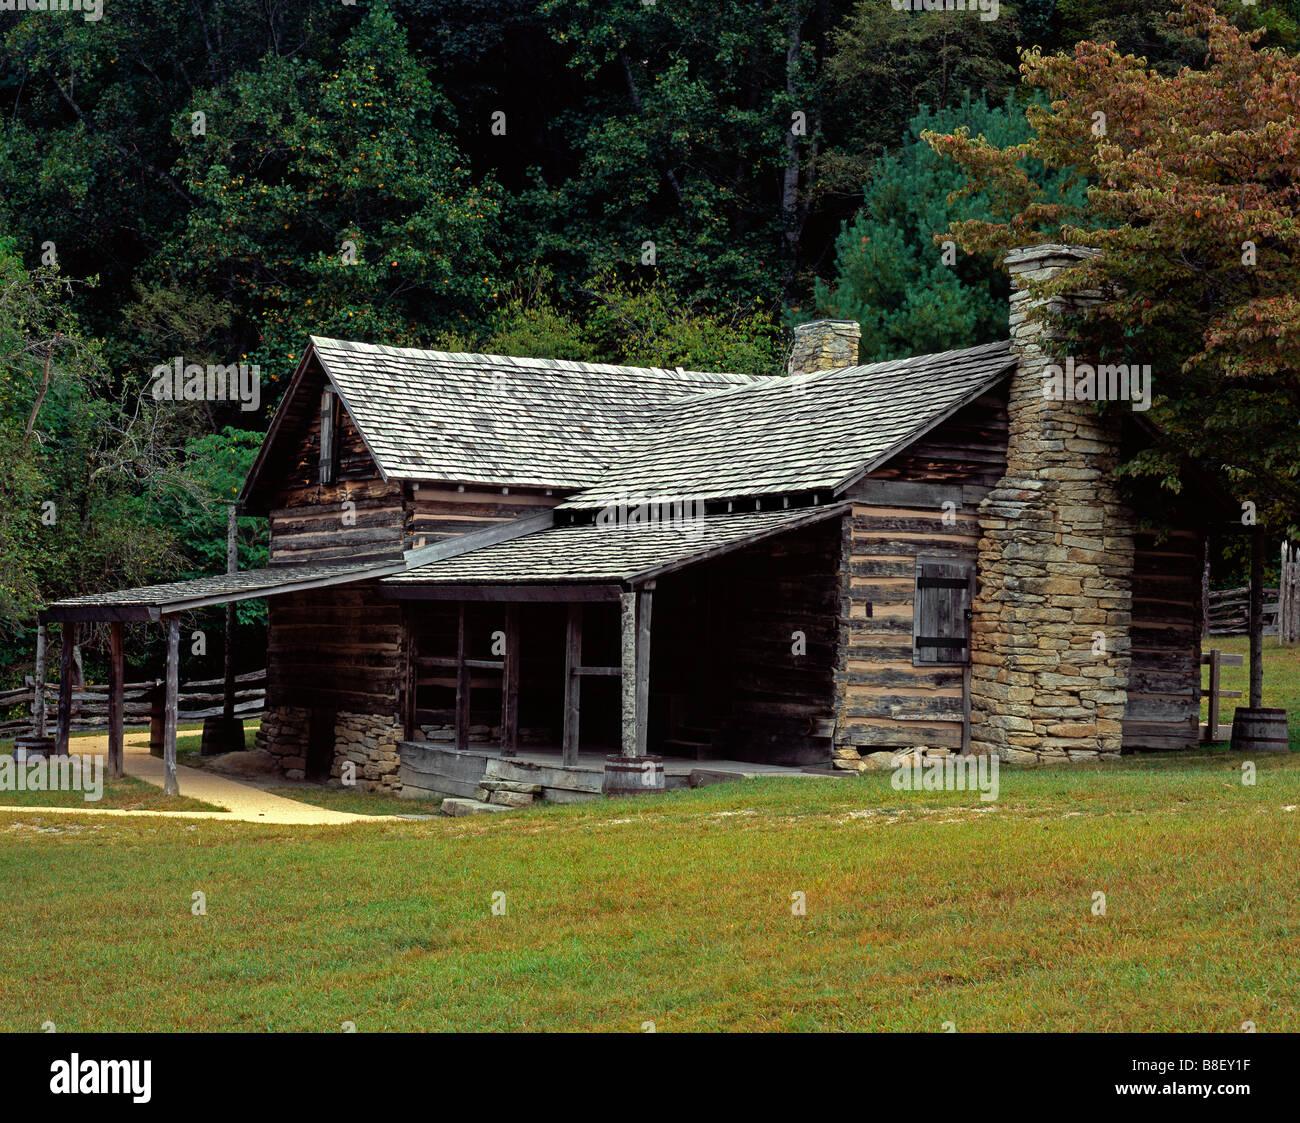 Charmant North Carolina   Historic Hutchinson Homestead At Stone Mountain